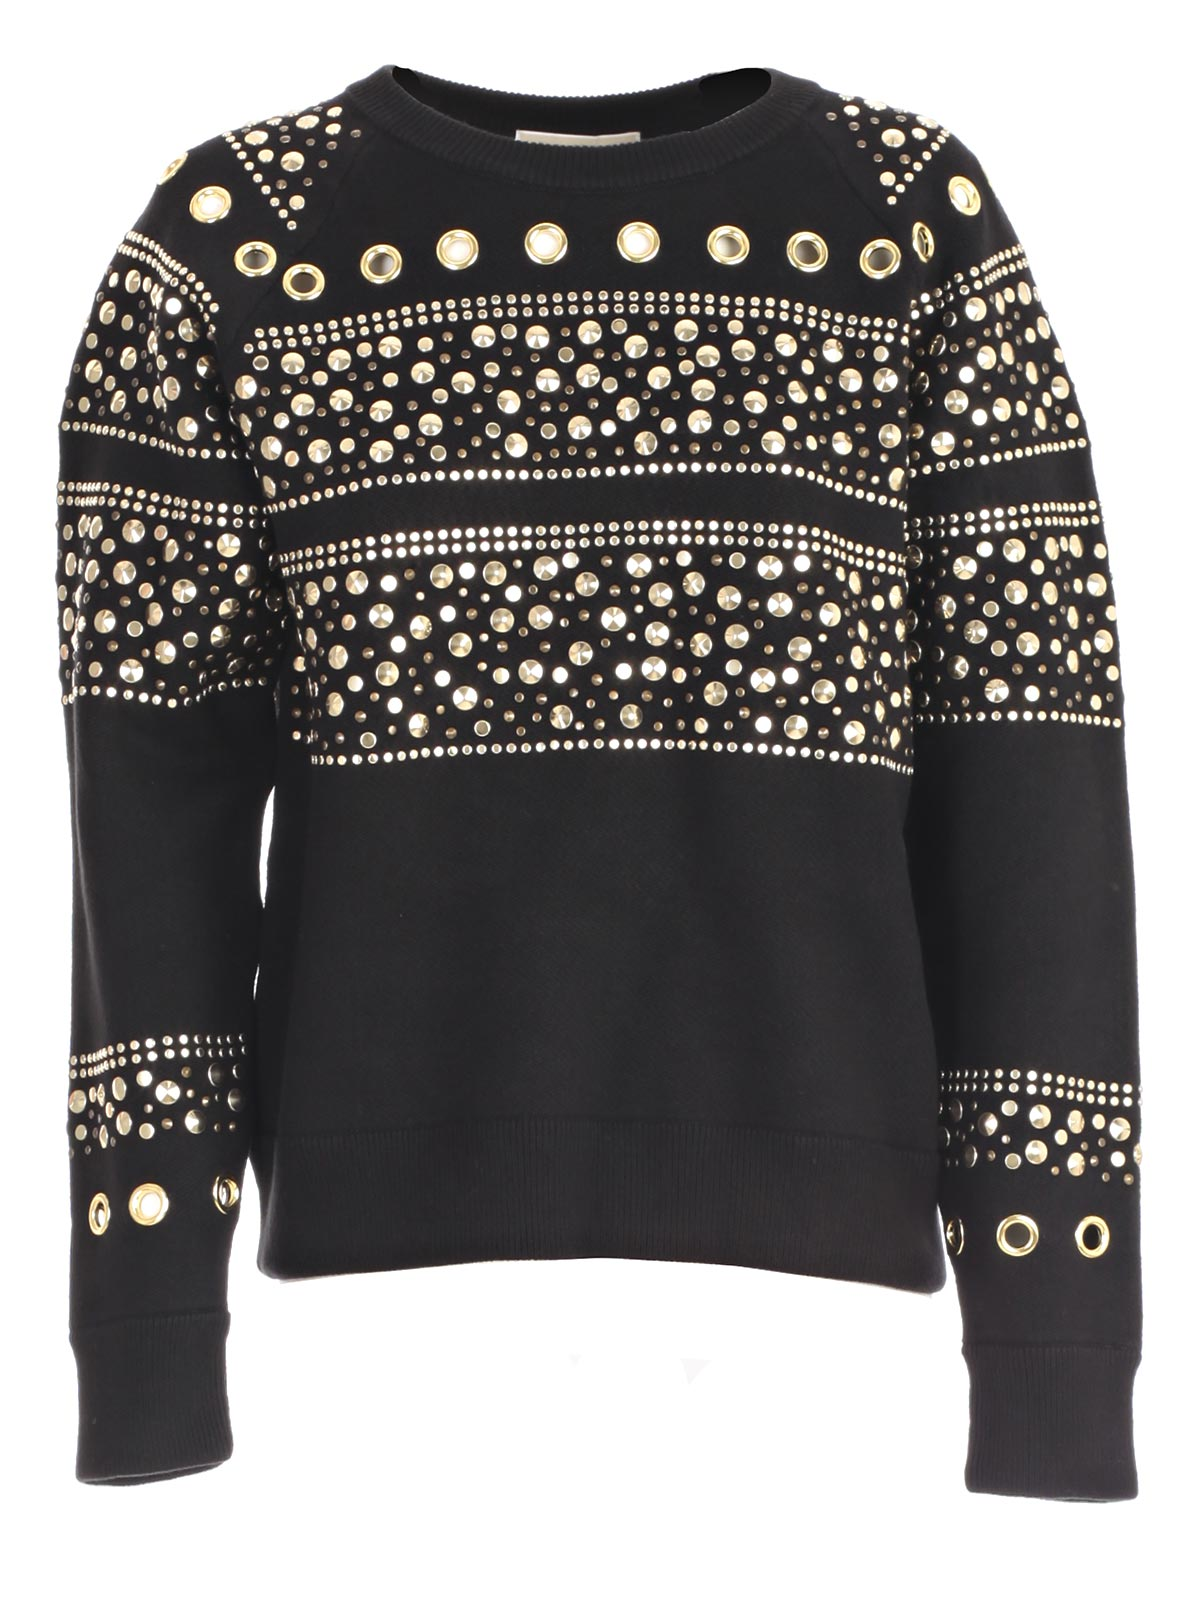 83b337ba72 Michael Michael Kors Sweatshirt MF76NDG4VG - 098 BLACK GOLD ...